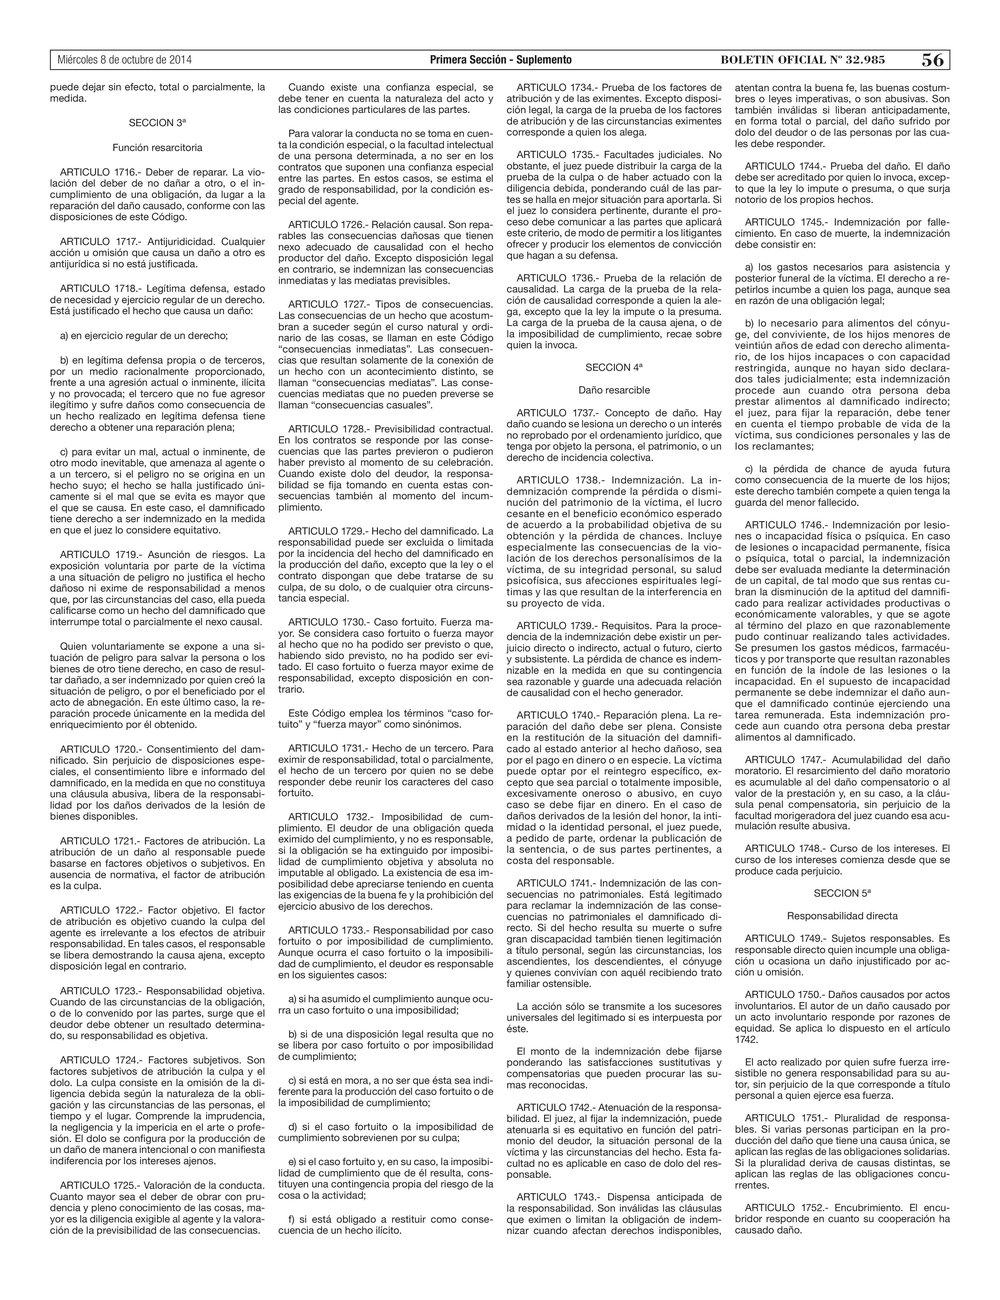 Argentina Codigo Civil-page-056.jpg